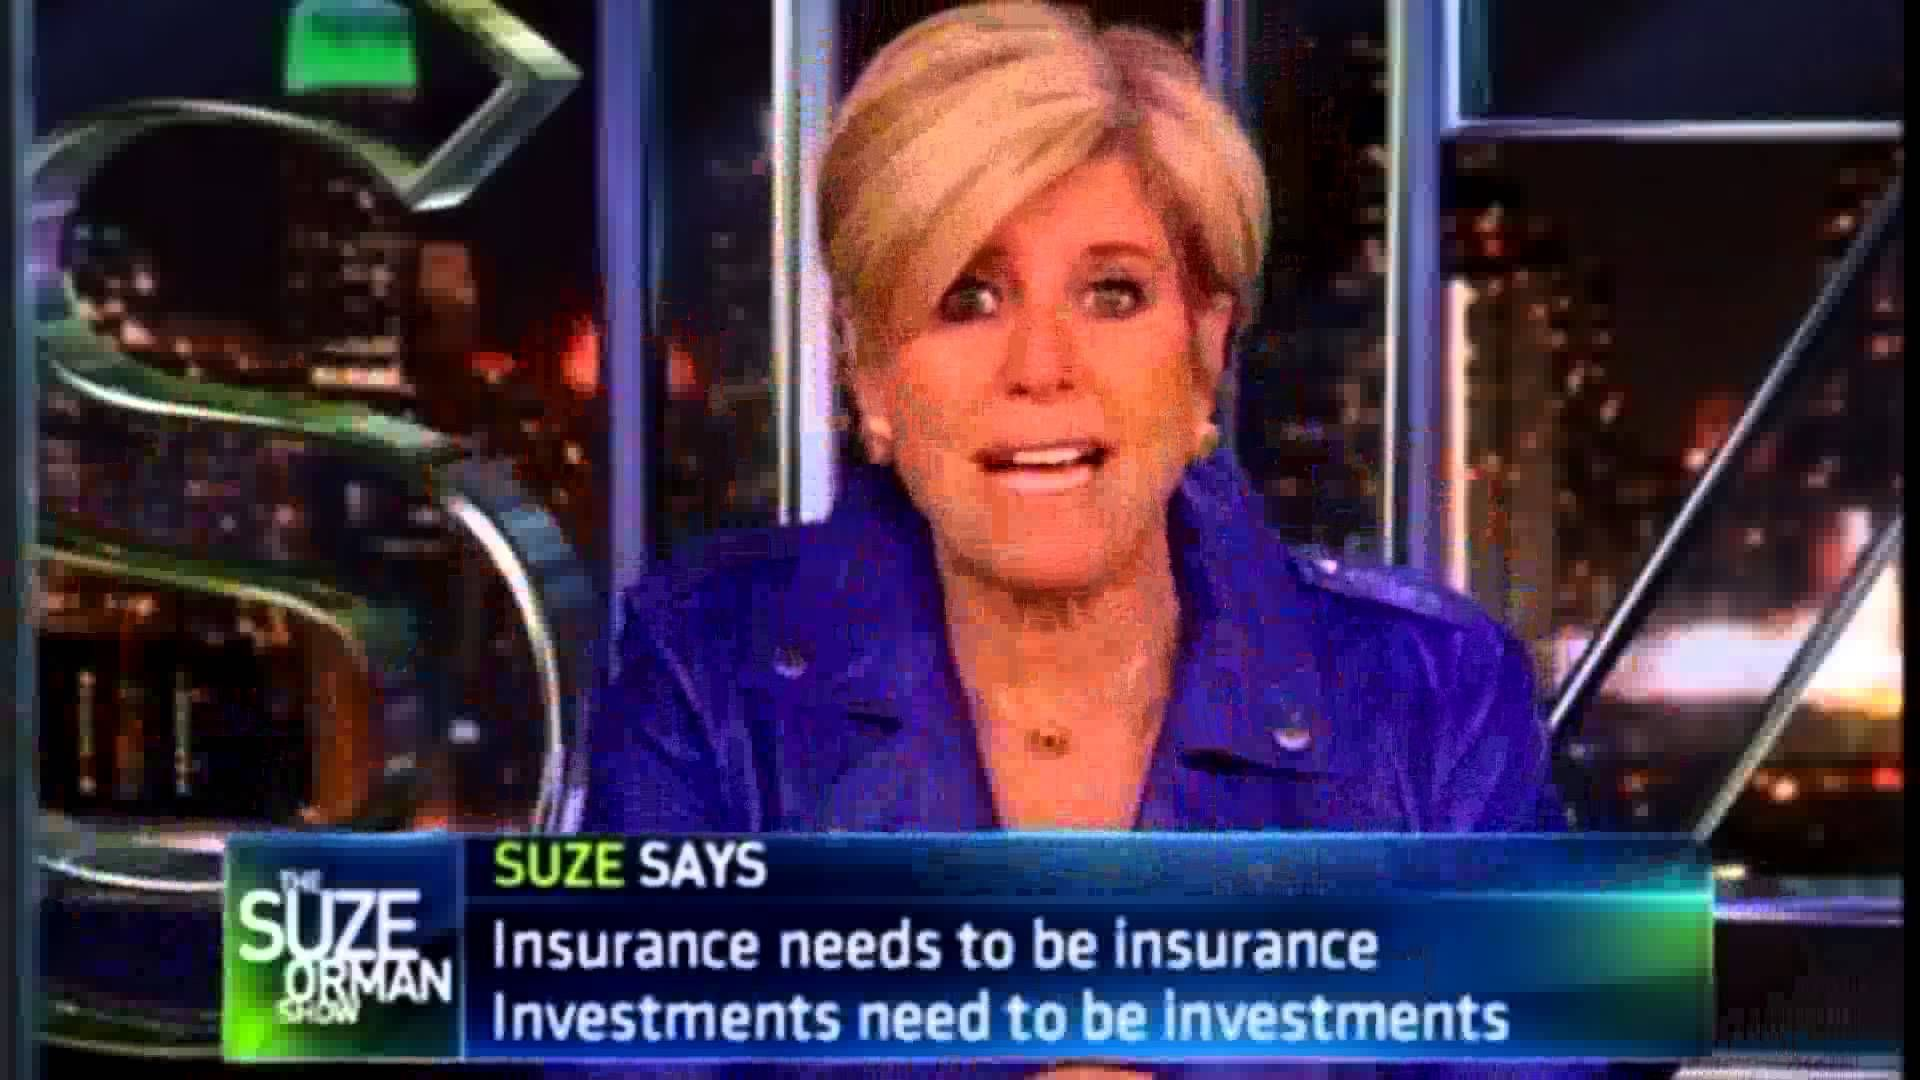 Suze Orman on Universal Insurance worlwide marketing ...